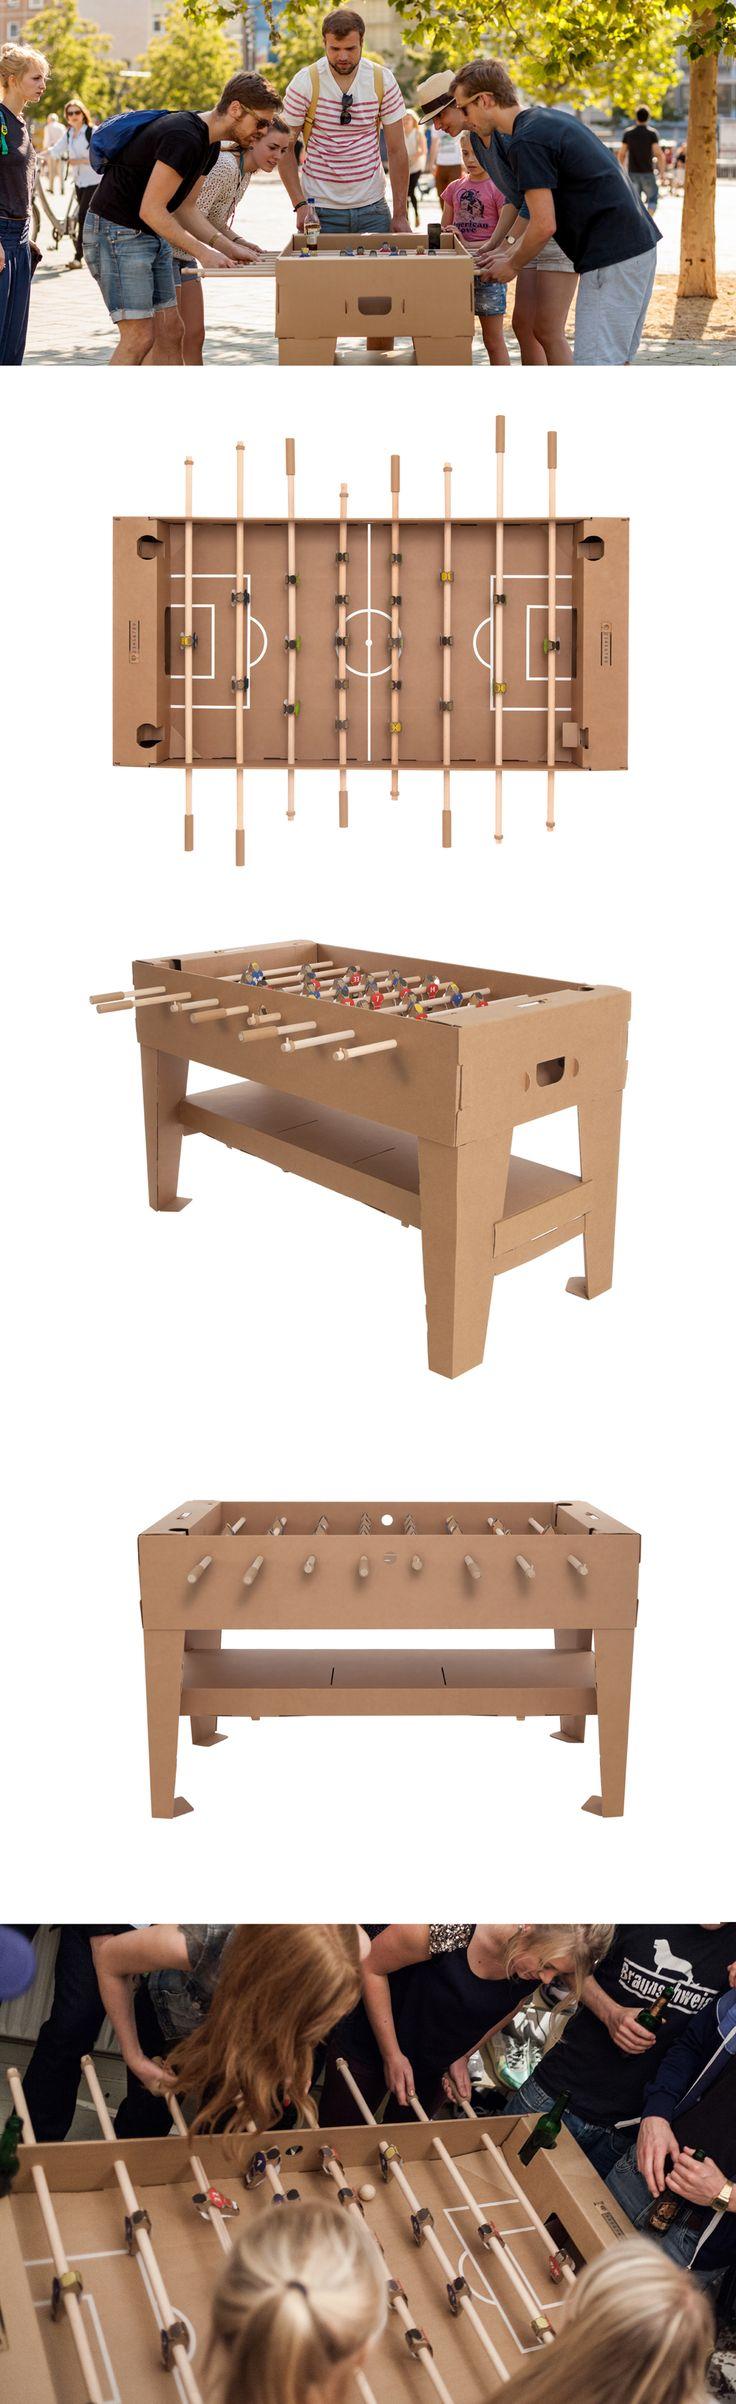 Soccer table in cardboard | futbolín de mesa de cartón | Avalilable at http://cartonlab.com/producto/futbolin-de-carton/ designed by Kickpack